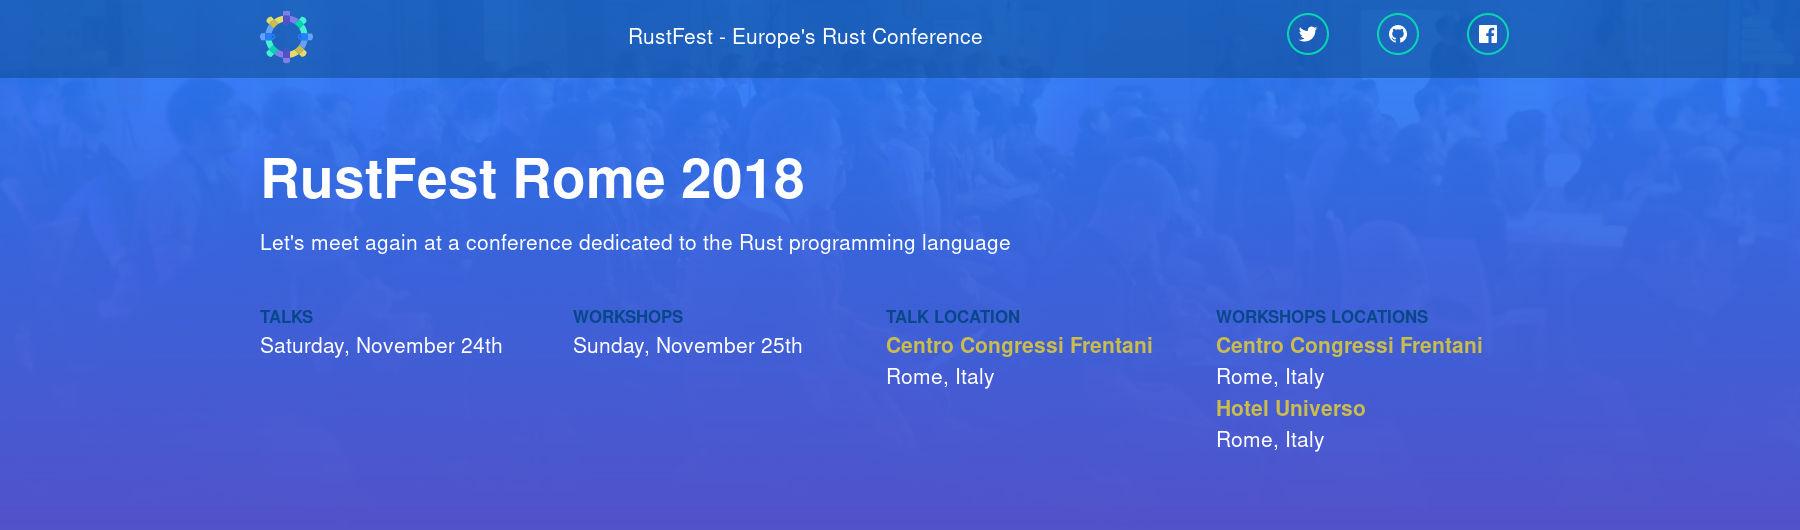 RustFest Rome 2018